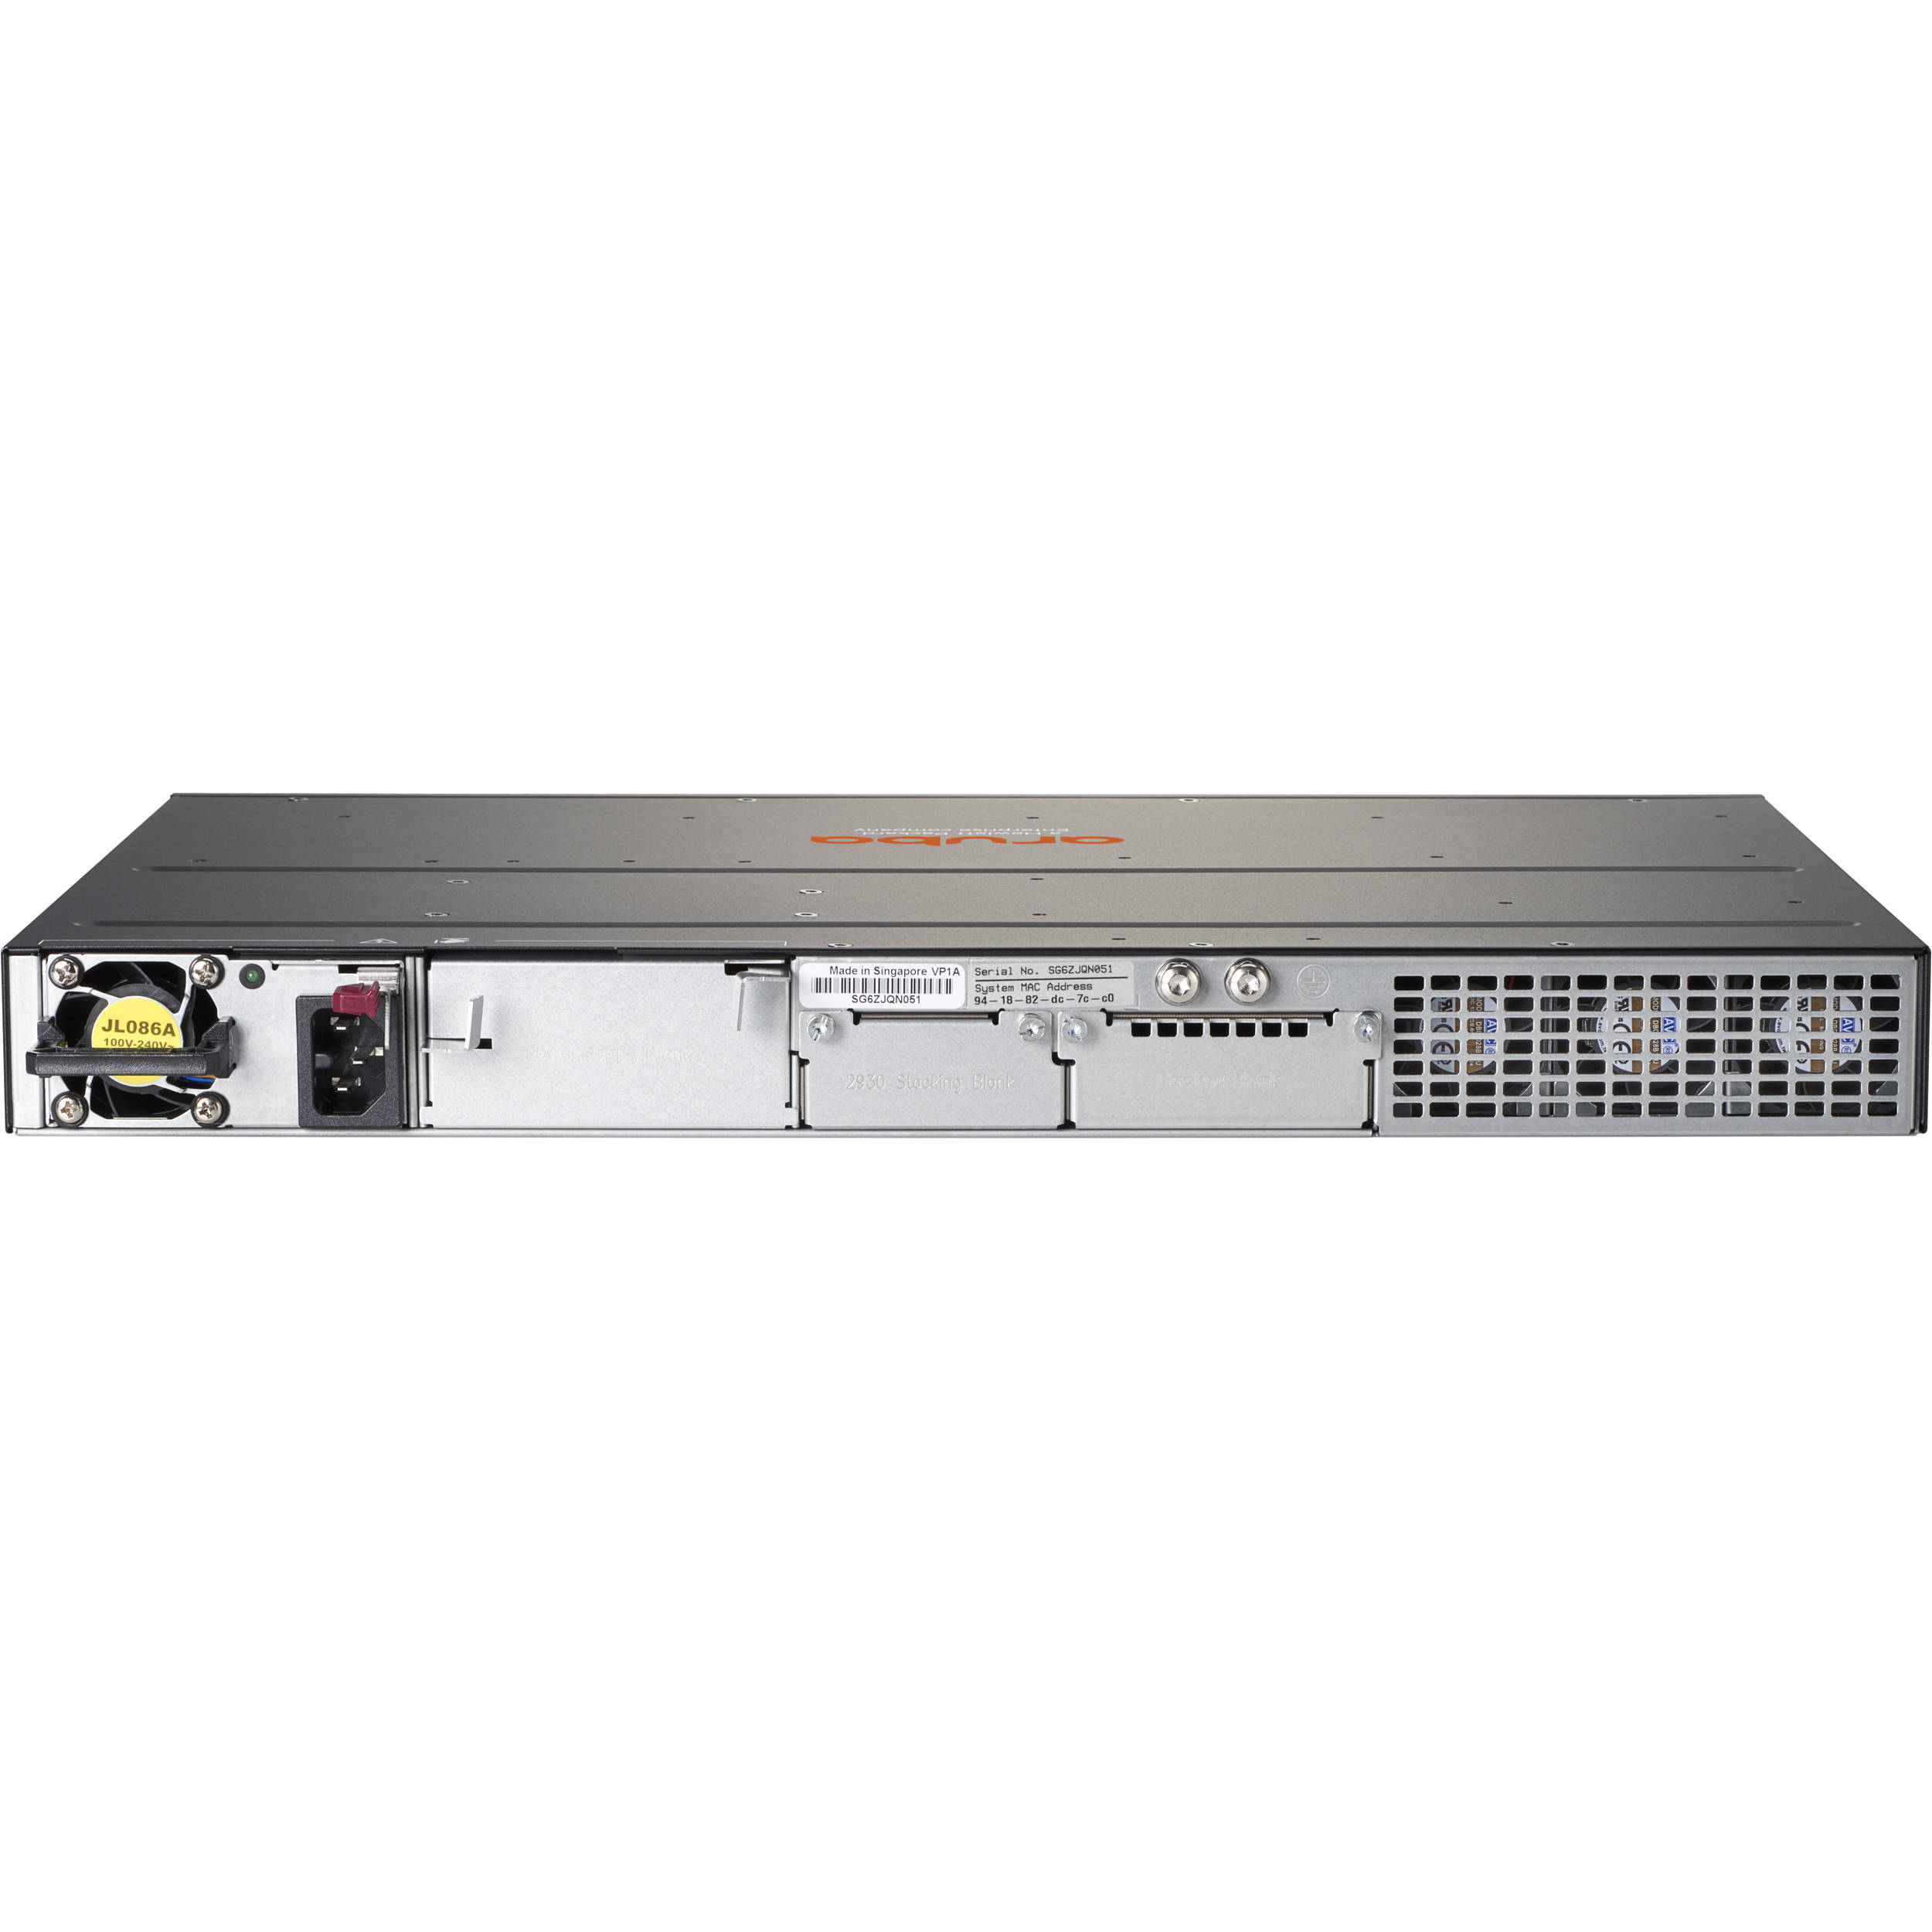 HP JL322A Aruba 2930M 48-Port Gigabit Ethernet 4SFP Switch